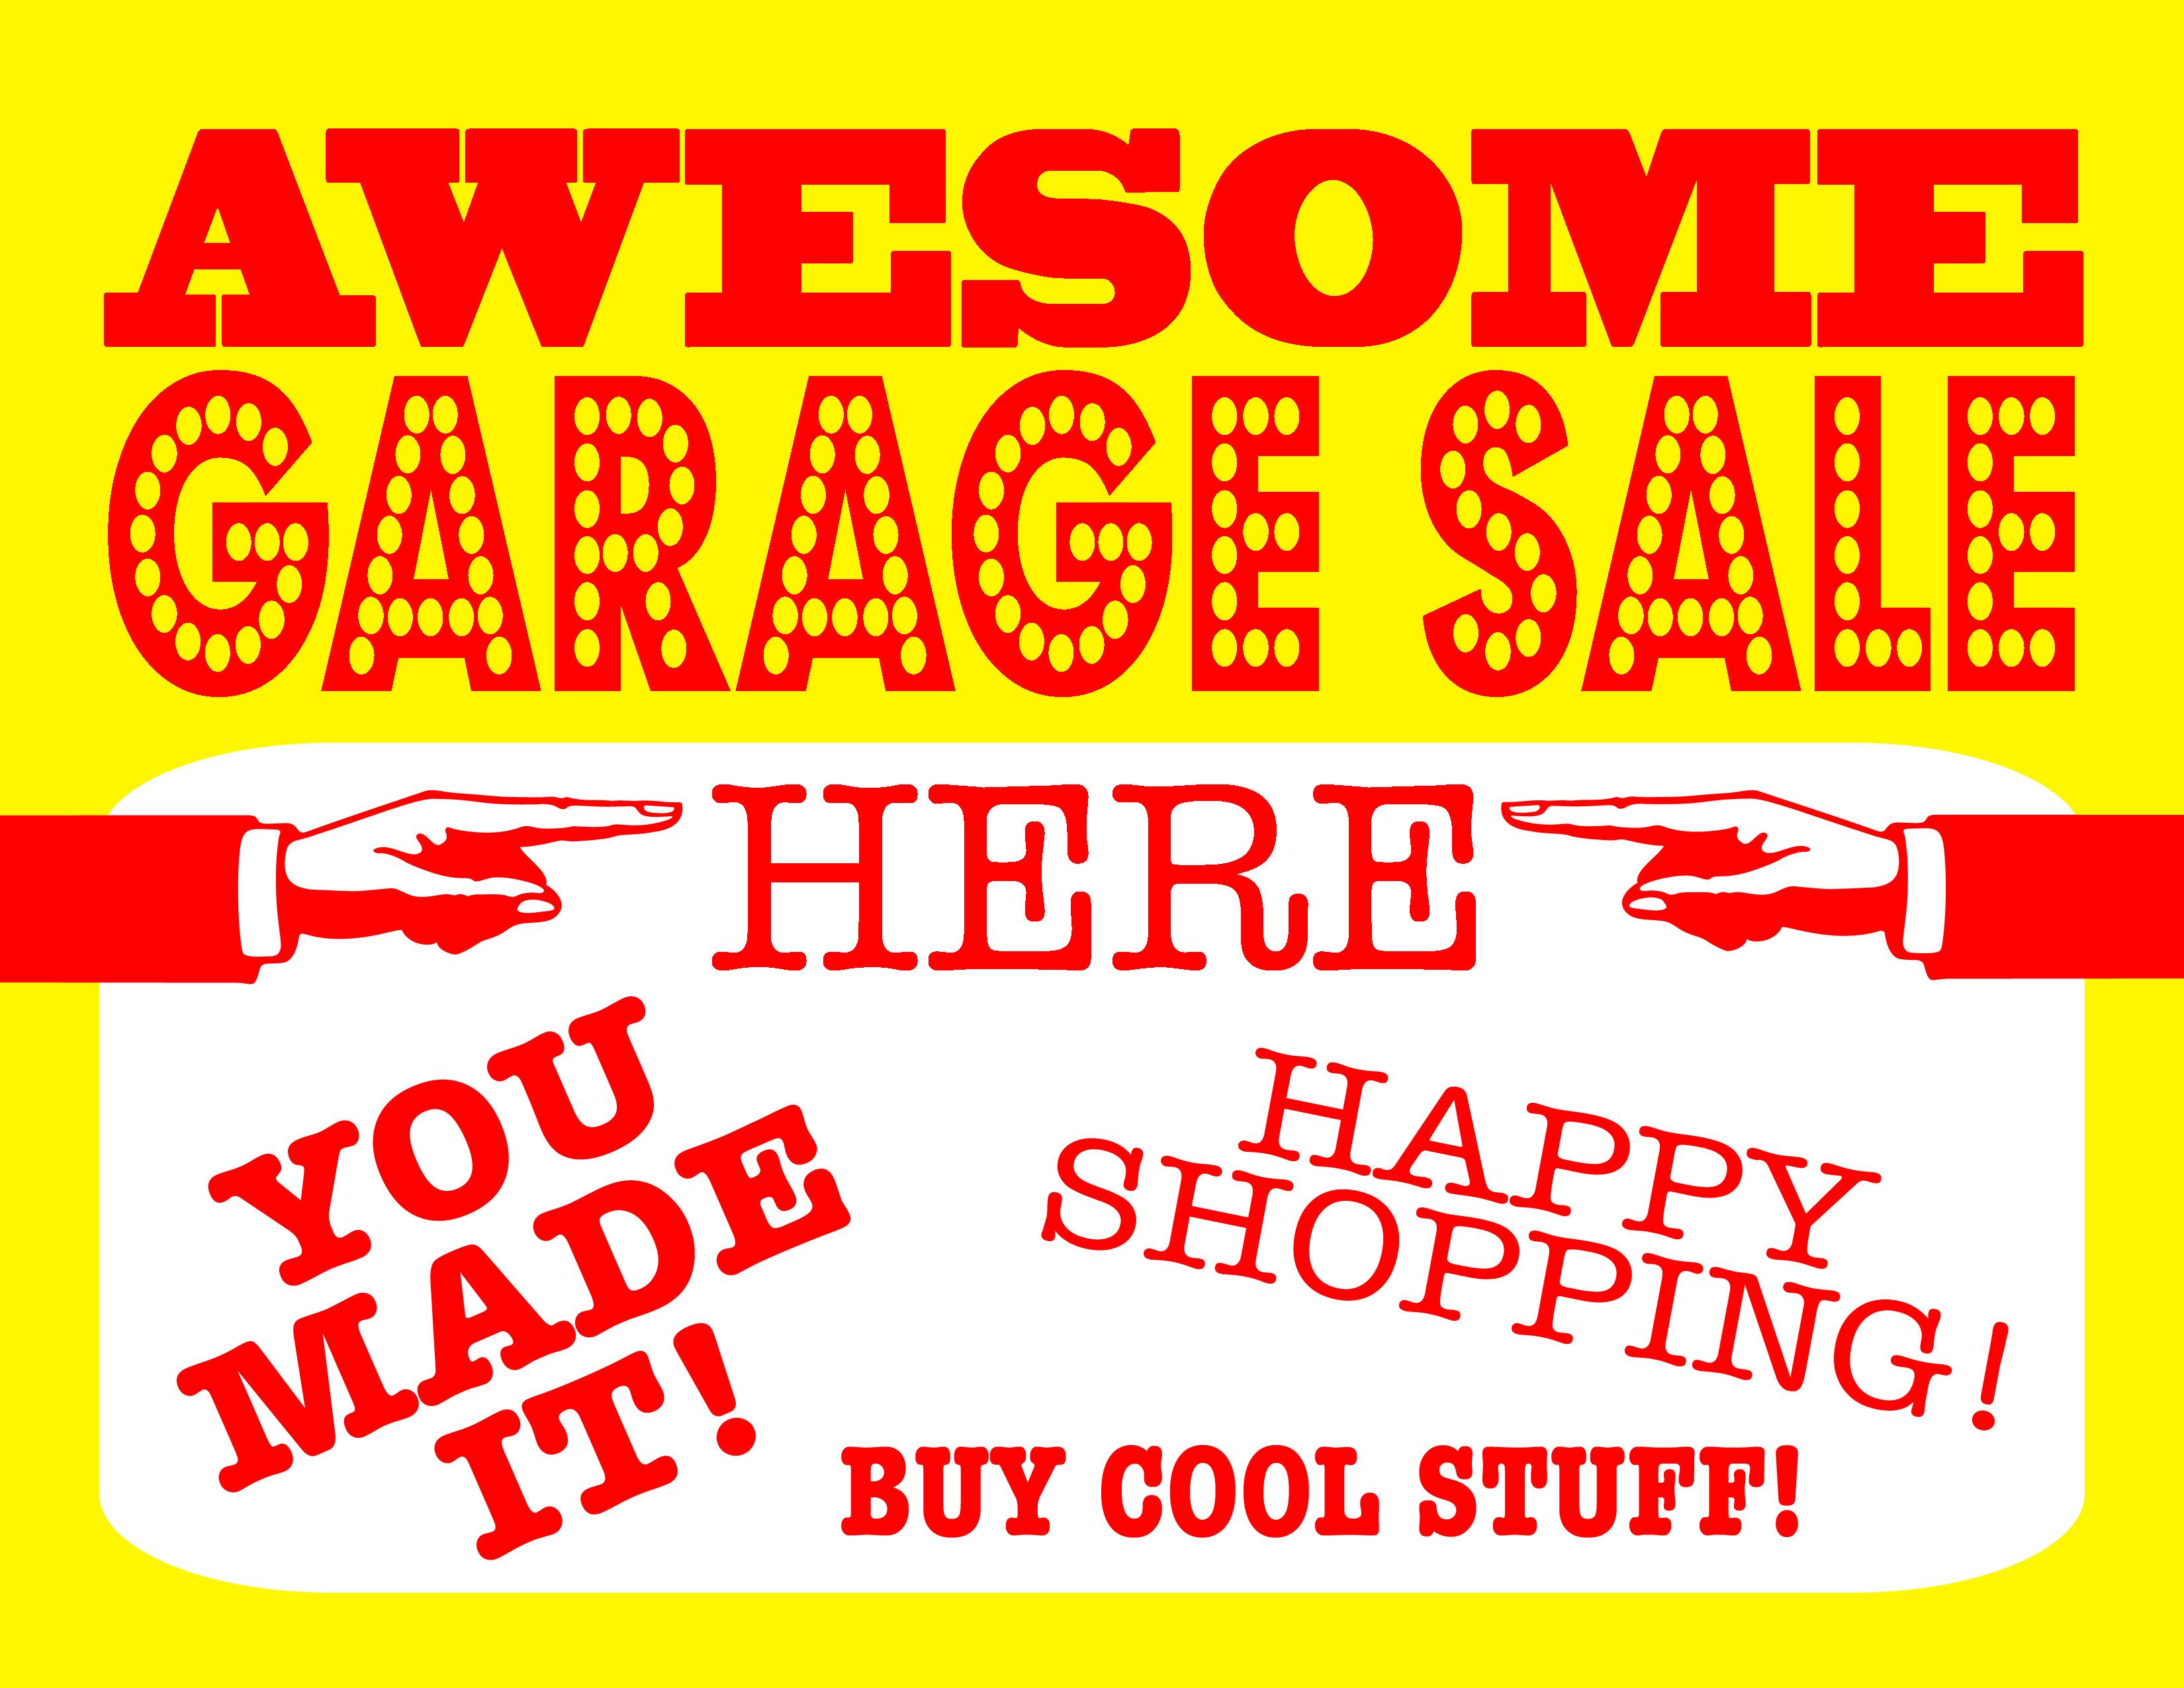 Diy Printable Awesome Garage Sale Signs - Free Printable Yard Sale Signs